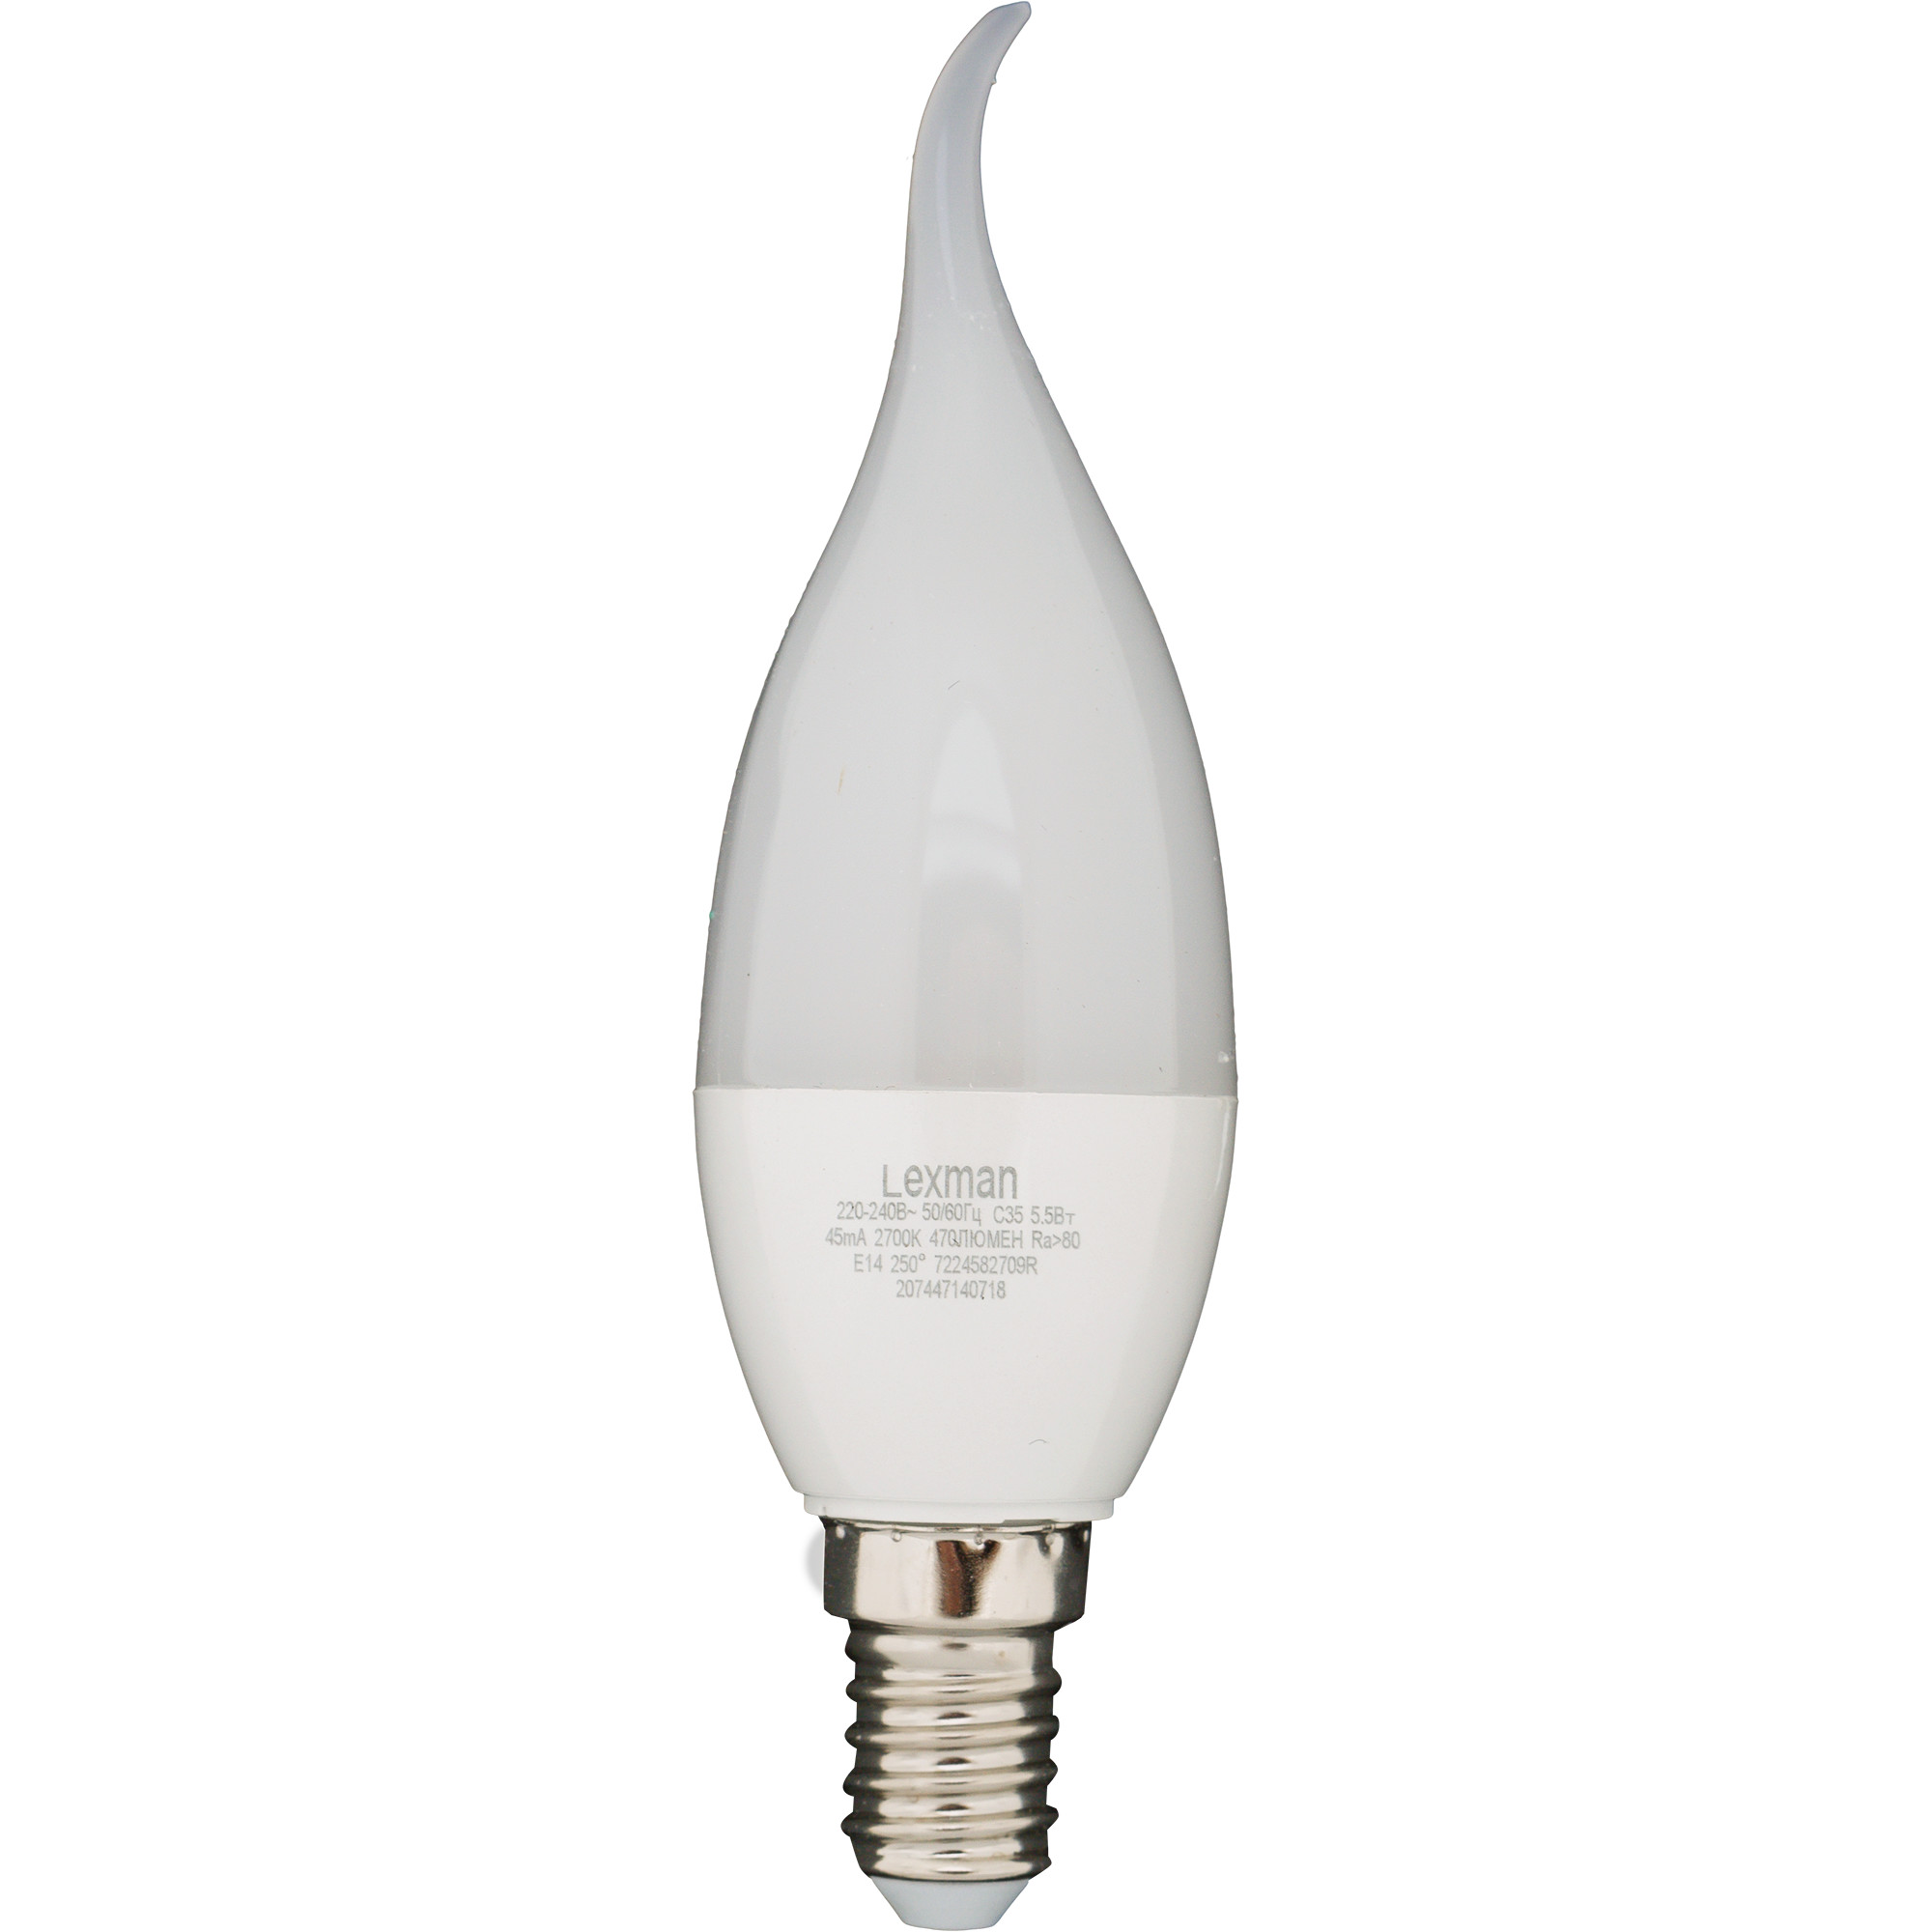 Лампа светодиодная Lexman Е14 5.5 Вт 470 Лм 2700 K свет тёплый белый